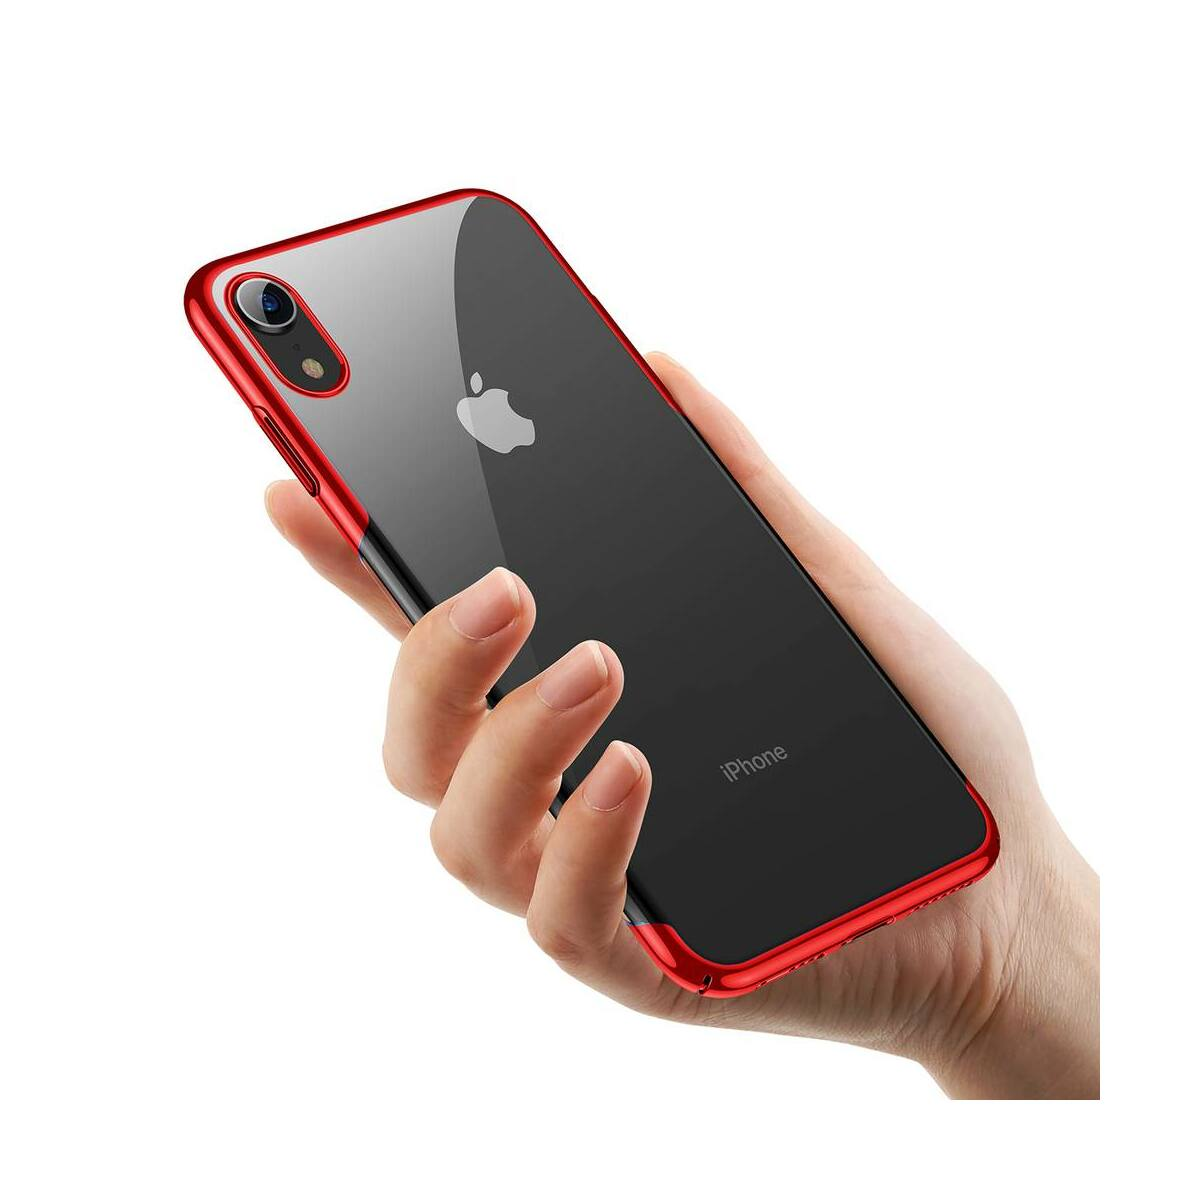 Baseus iPhone XR tok, Glitter, piros (WIAPIPH61-DW09)